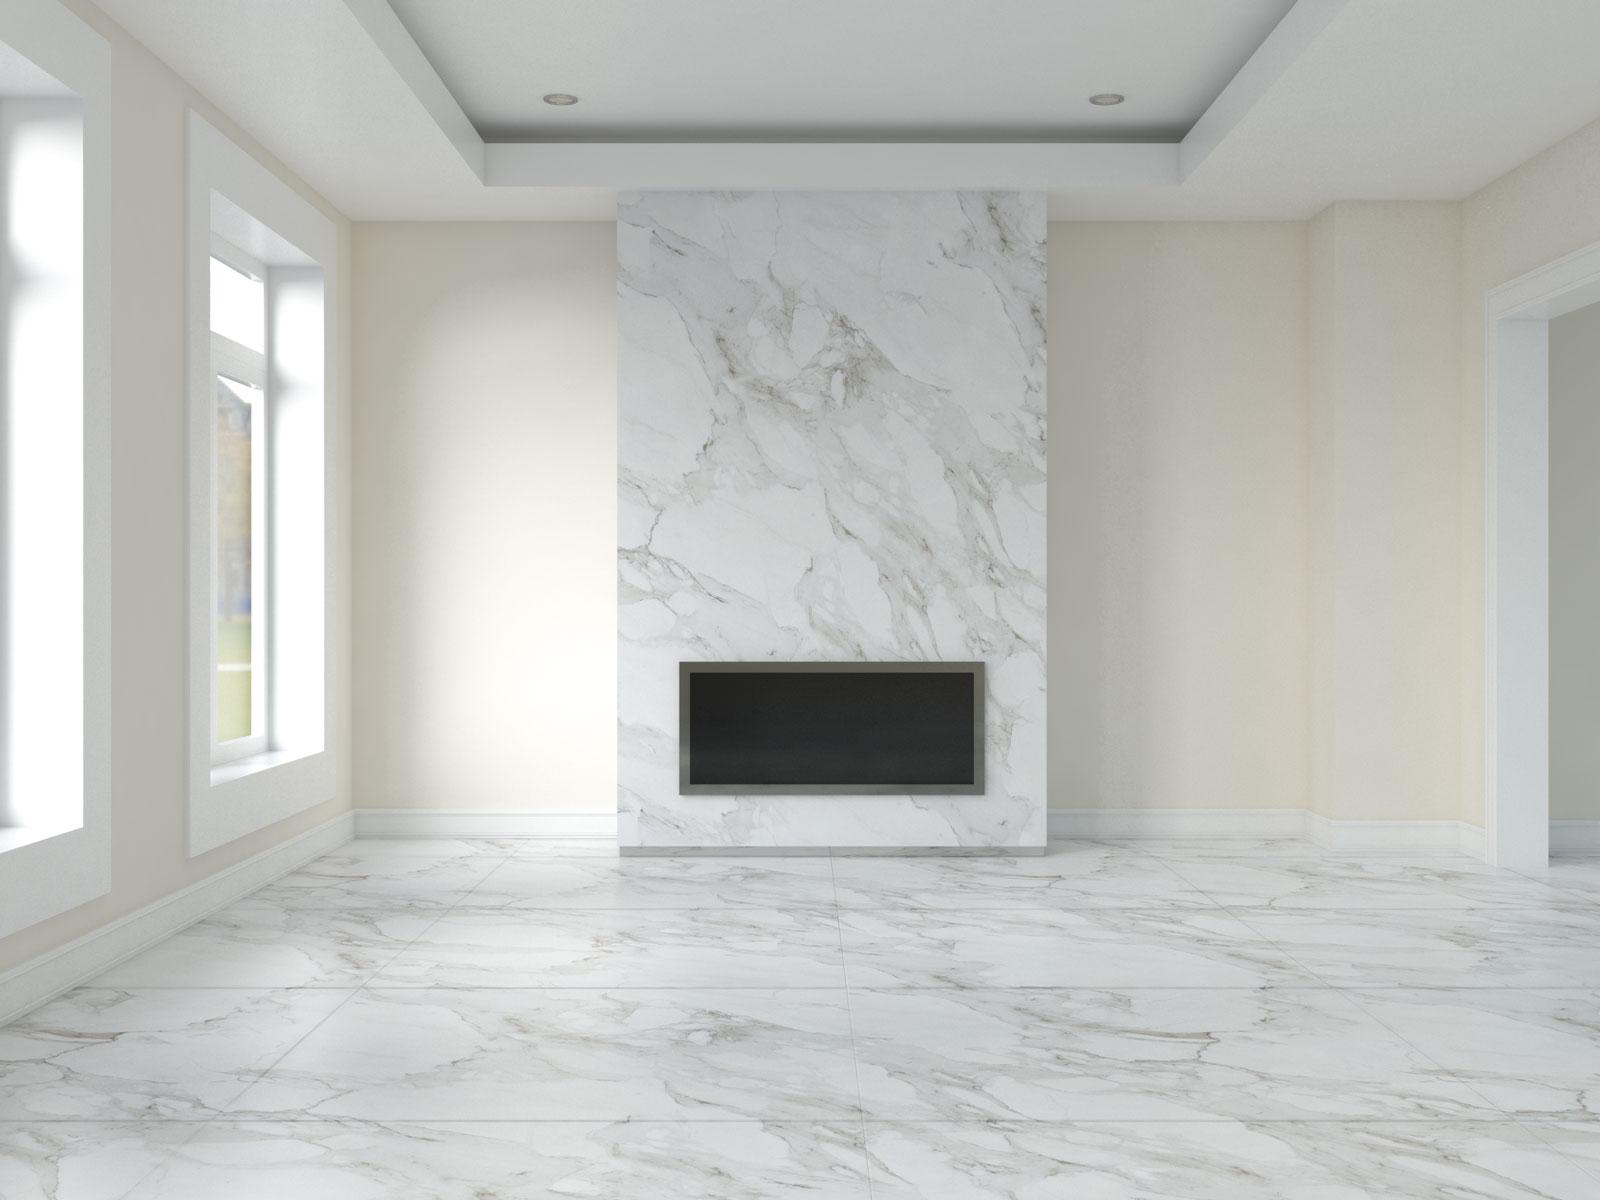 White flour walls with carrara marble flooring